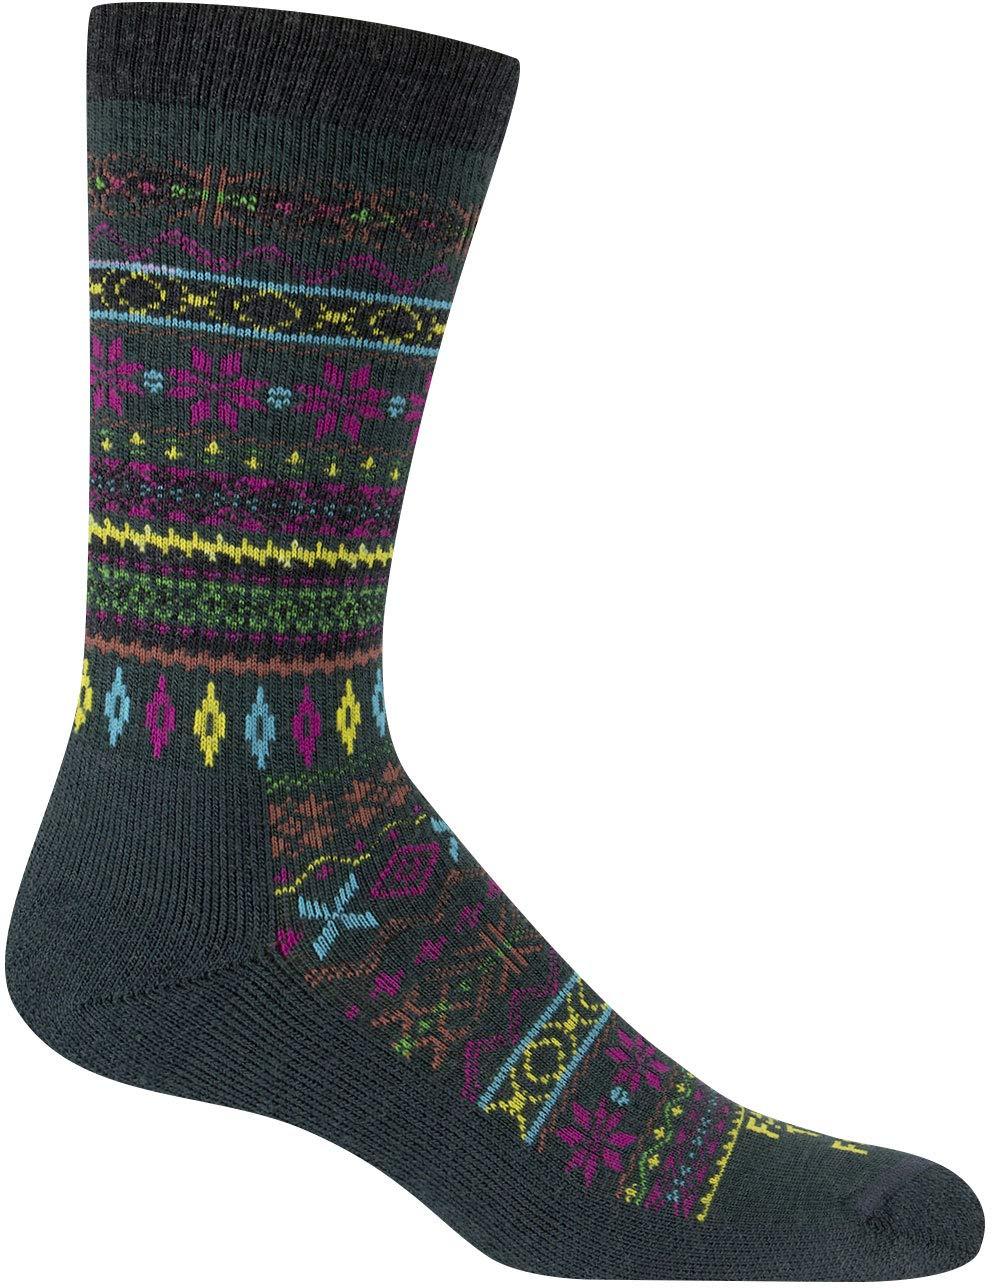 Farm to Feet Women's Lightweight Hamilton Fair Isle Crew Merino Wool Socks